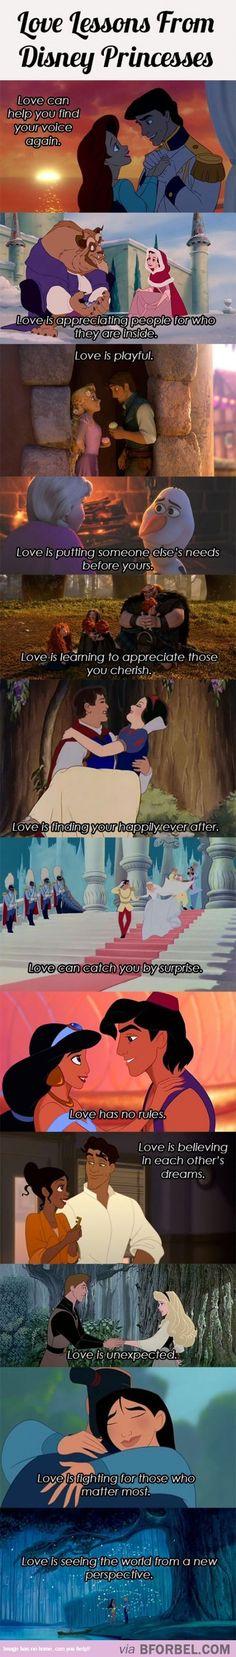 12 Love Lessons That Disney Princesses Taught Us…